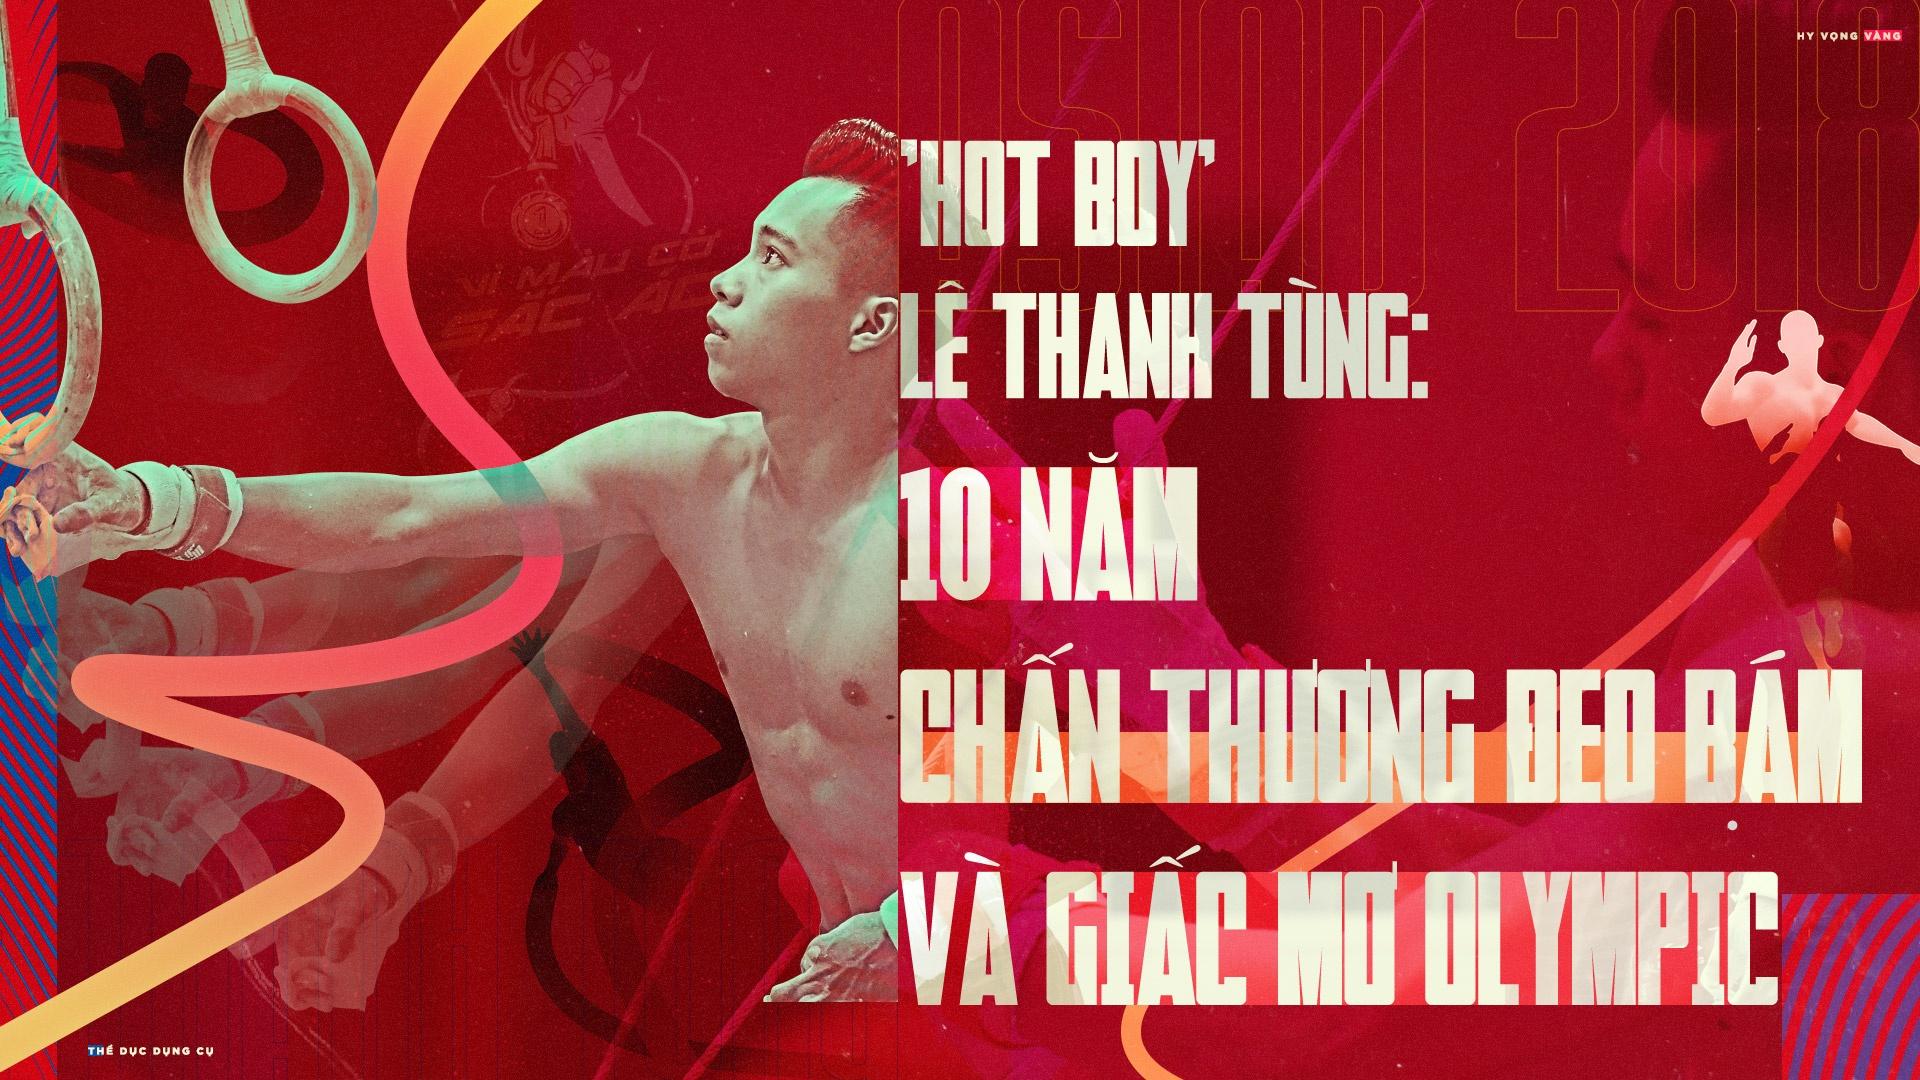 'Hot boy' Le Thanh Tung: 10 nam chan thuong deo bam va giac mo Olympic hinh anh 2